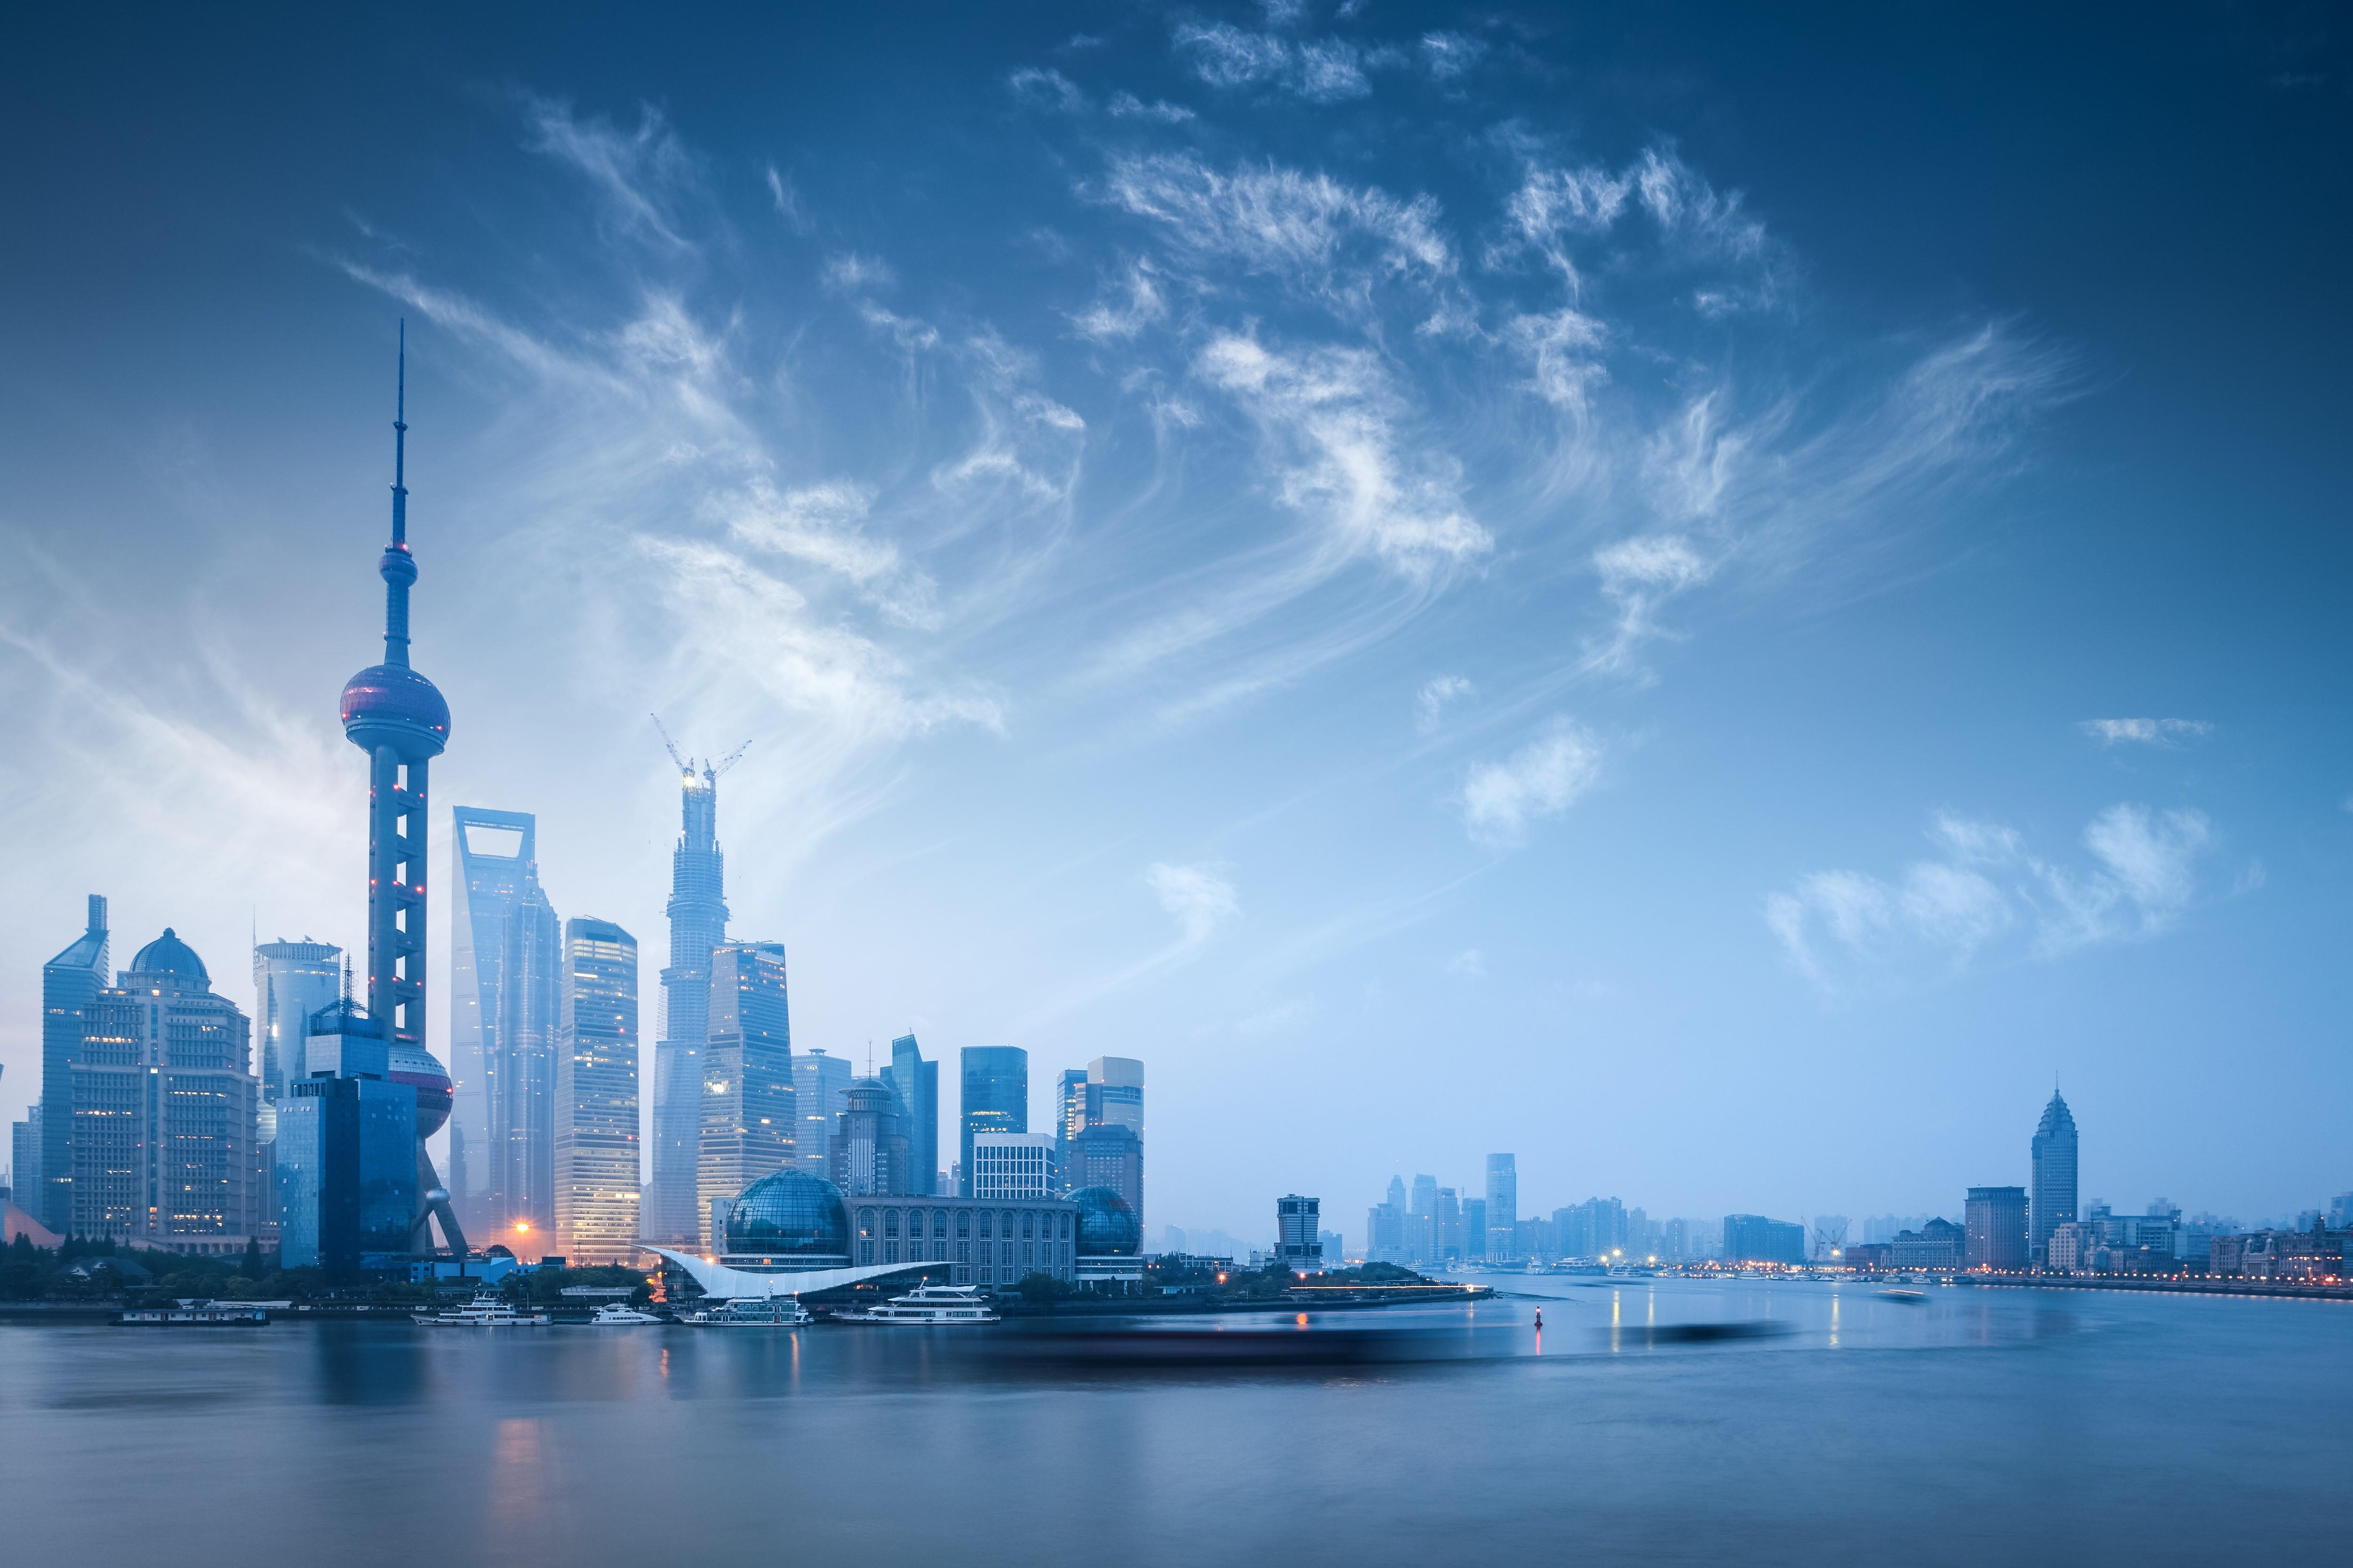 Wallpaper Sea City Cityscape Reflection Sky Skyline